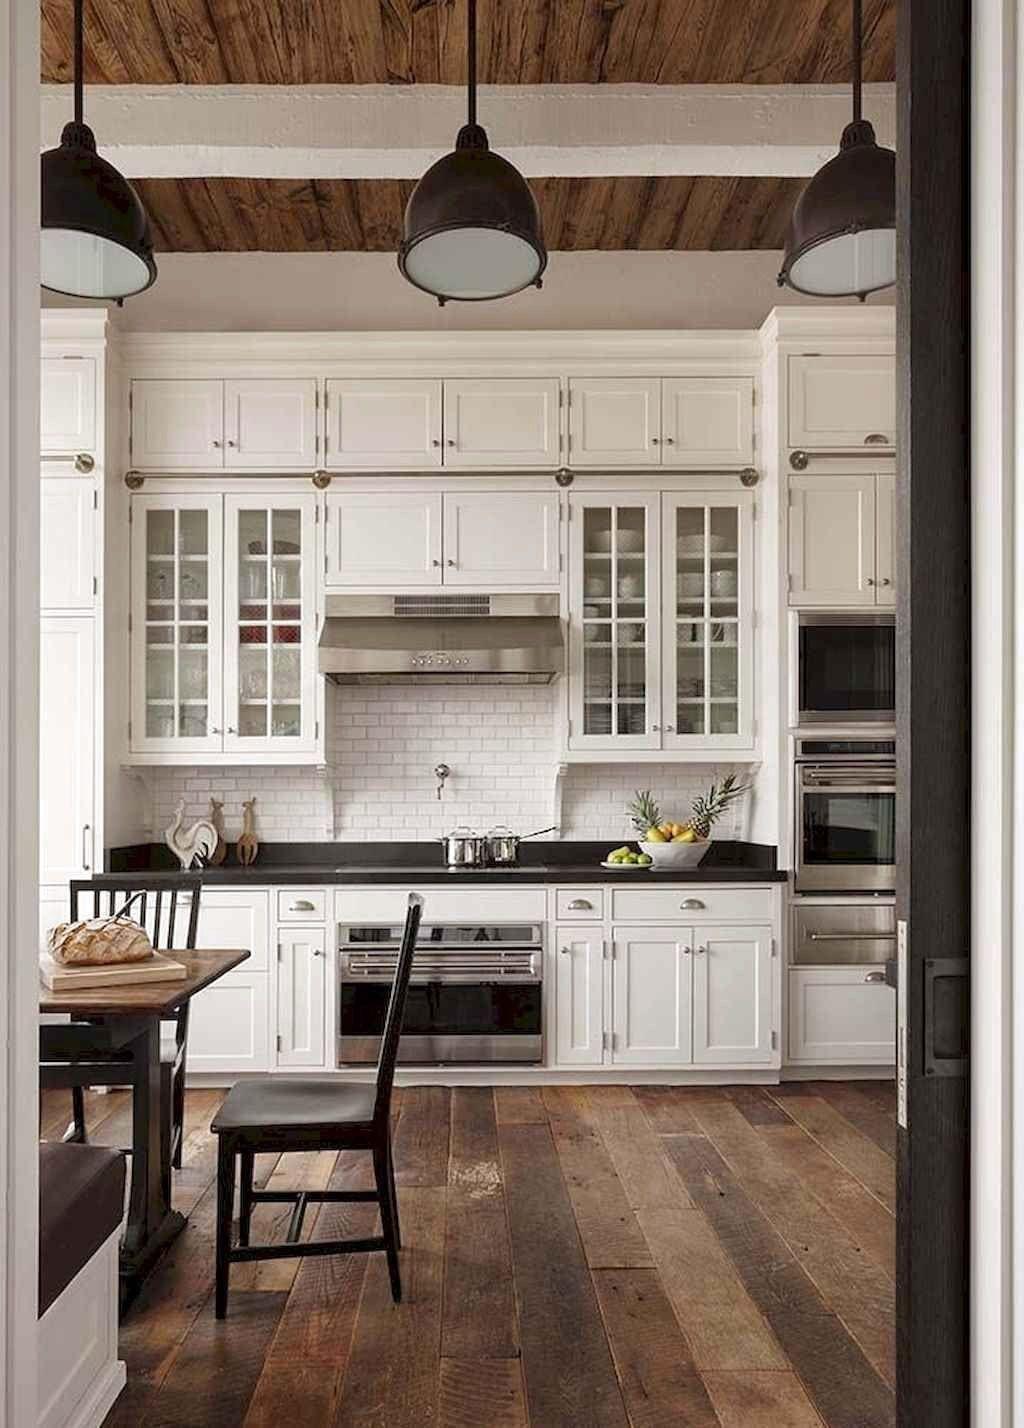 20+ Crative Farmhouse Kitchen Design Ideas For Fun Cooking To Try #farmhousekitchencolors